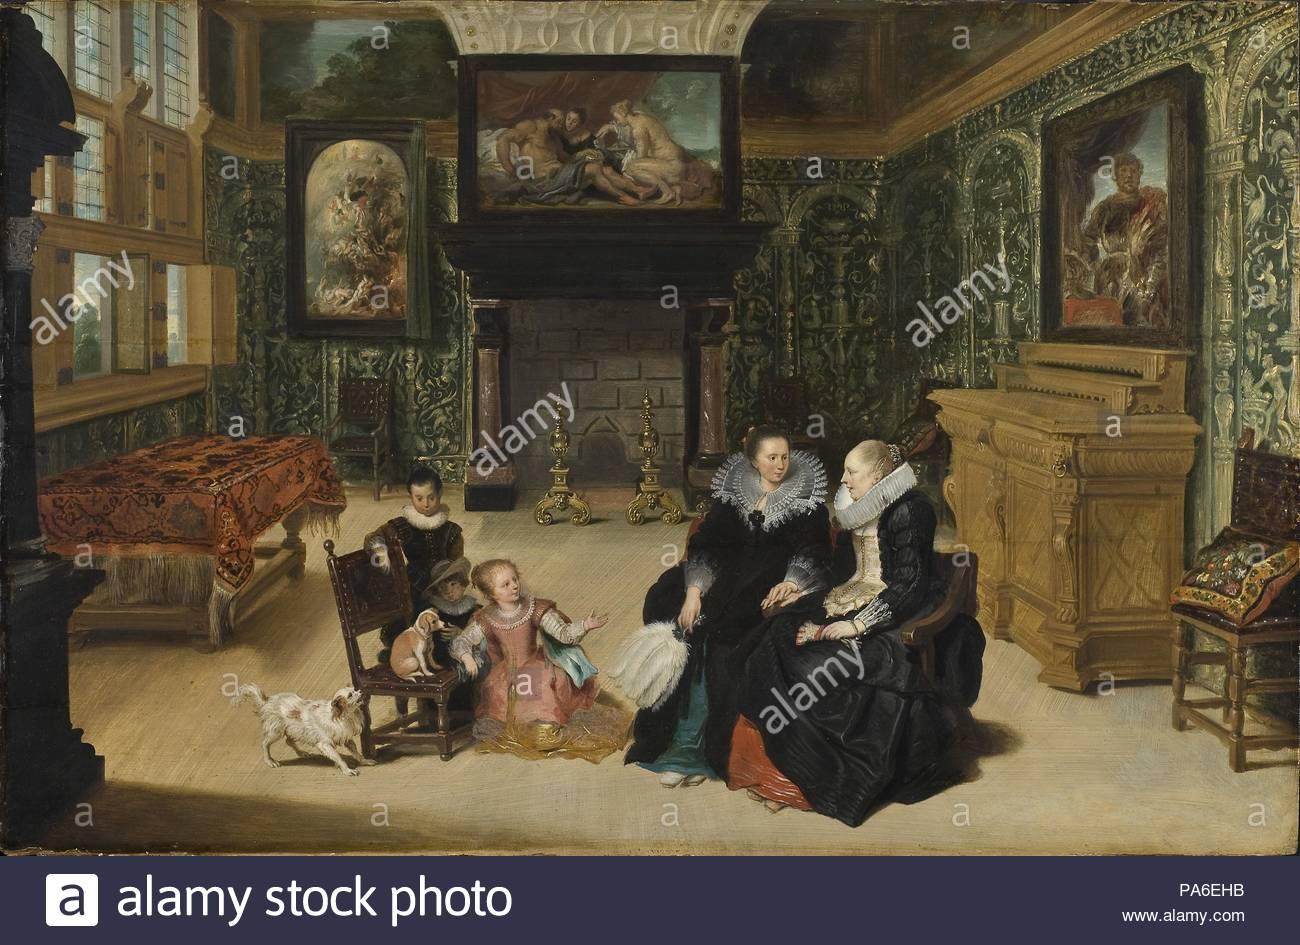 De Vos Cornelis Stockfotos & De Vos Cornelis Bilder - Seite 2 - Alamy